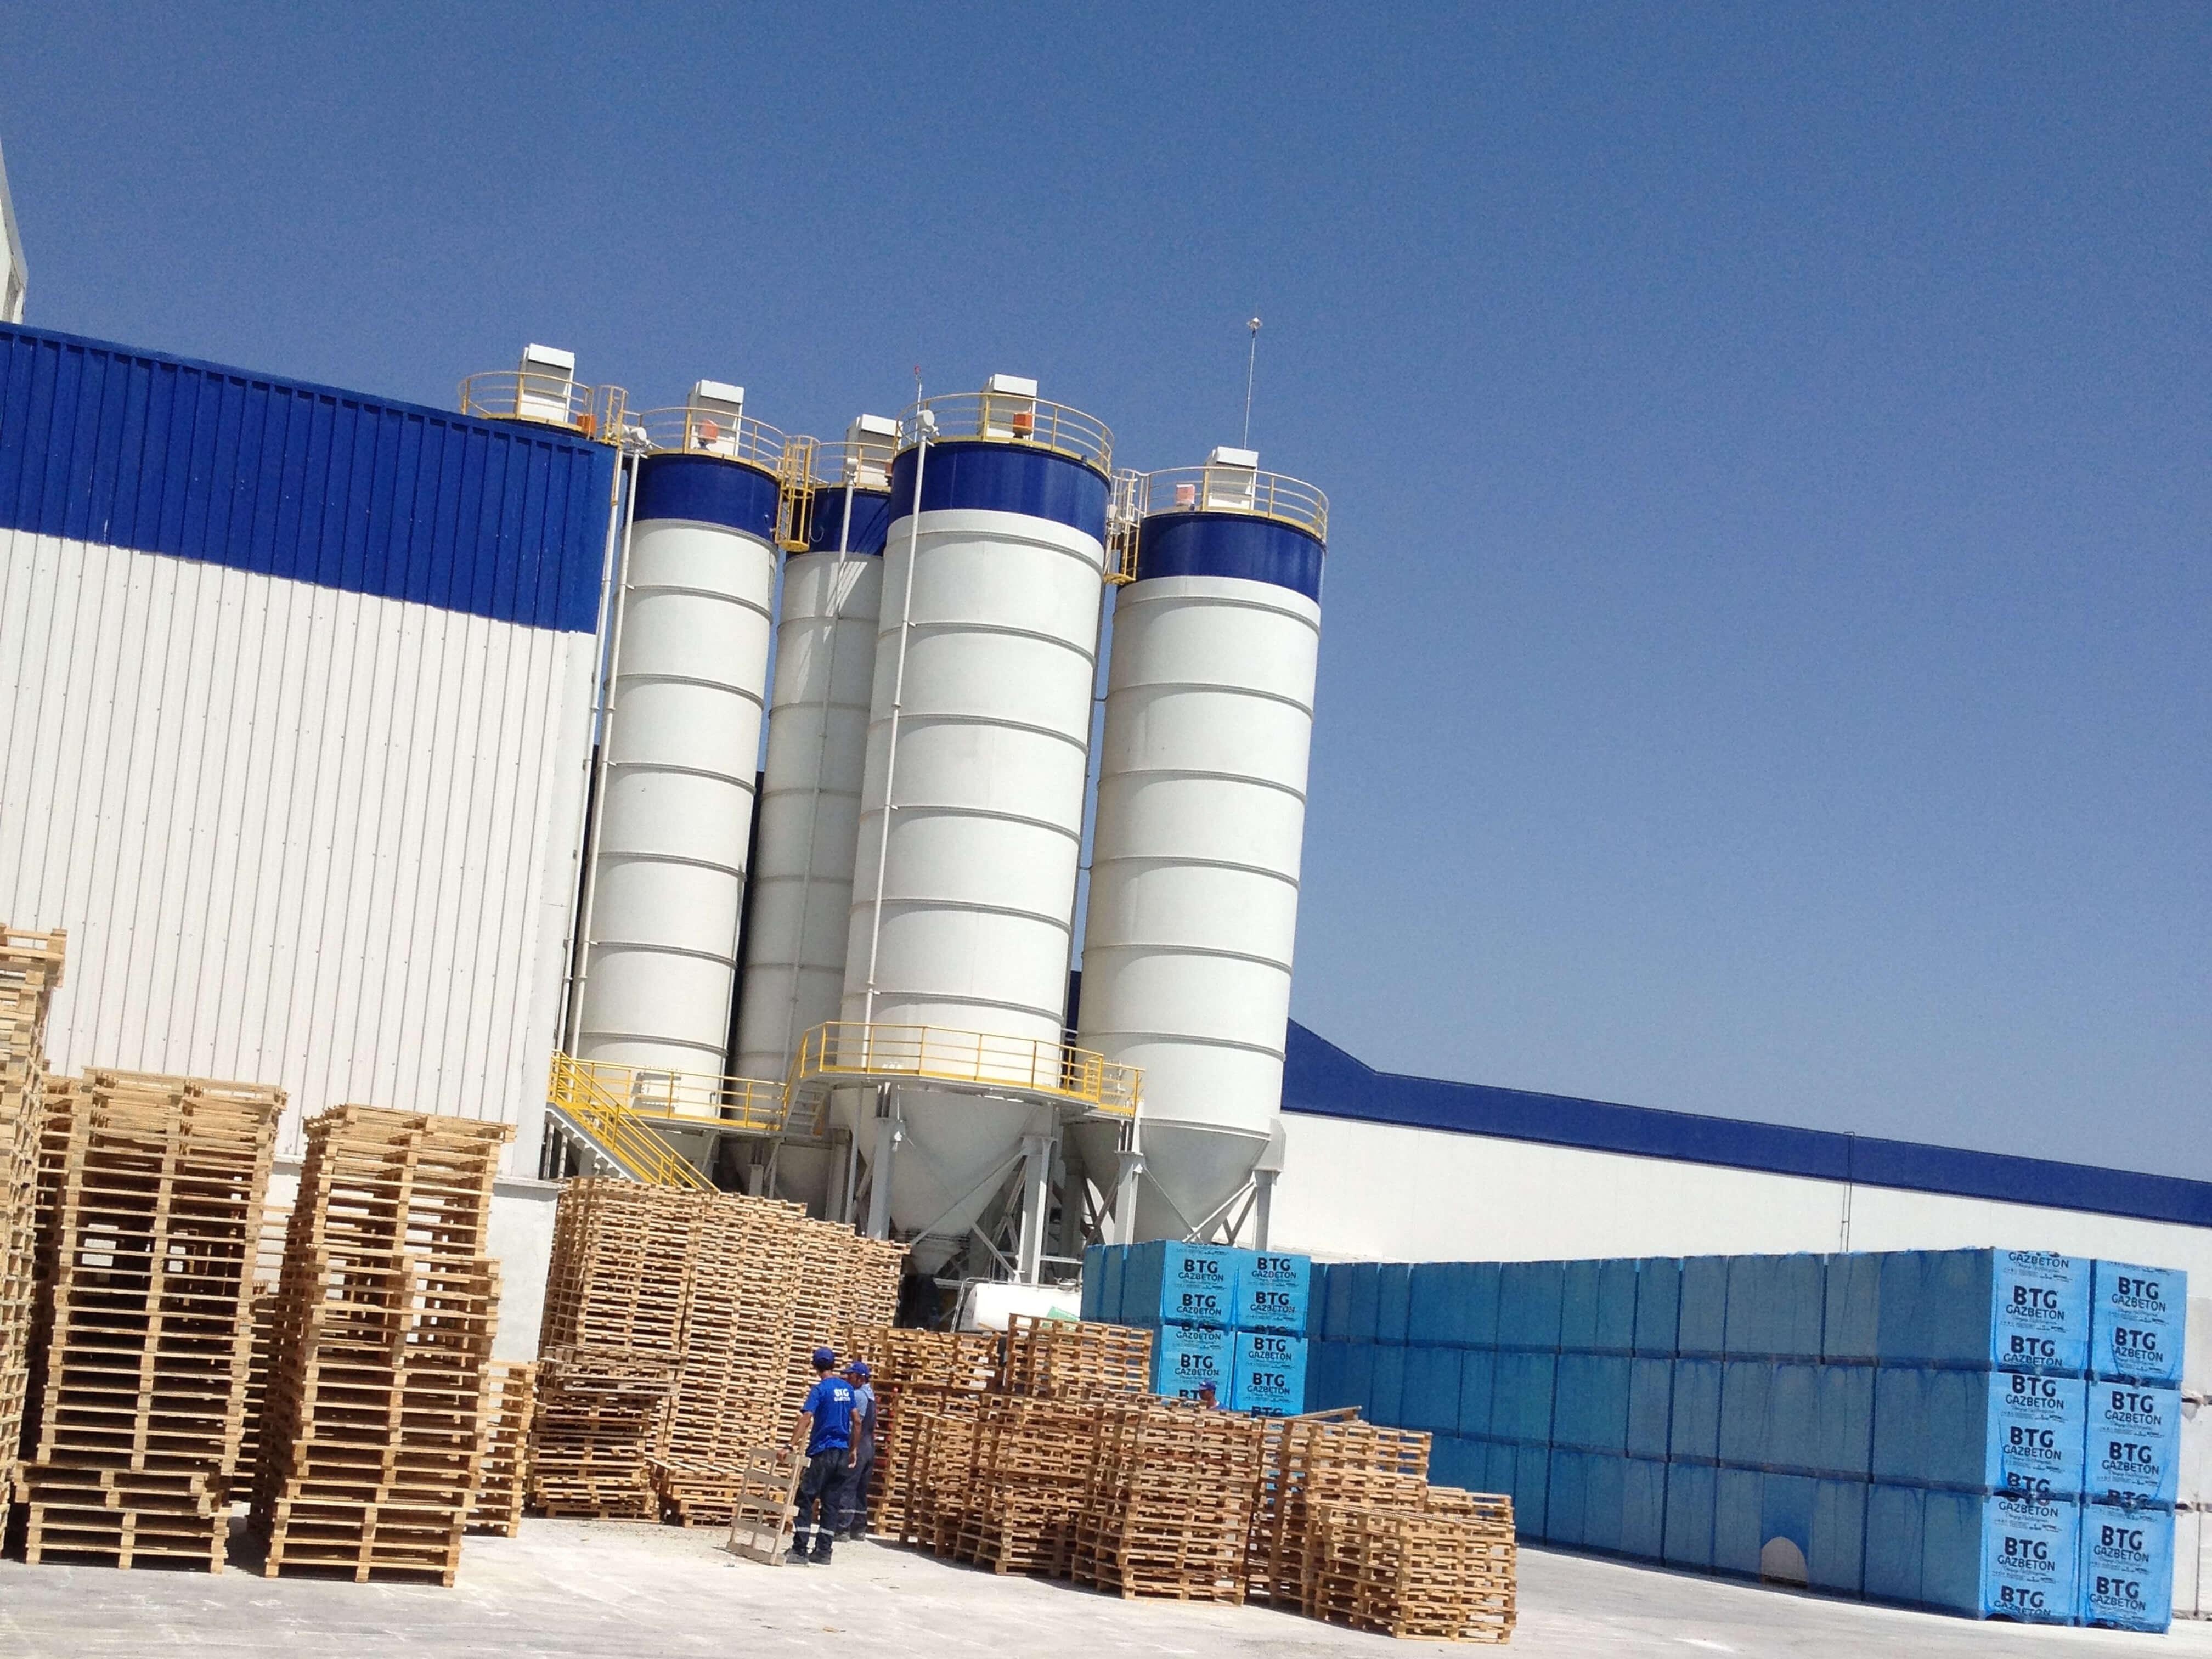 Osmaniye Gas Concrete Adhesive Installation 12 ton/h